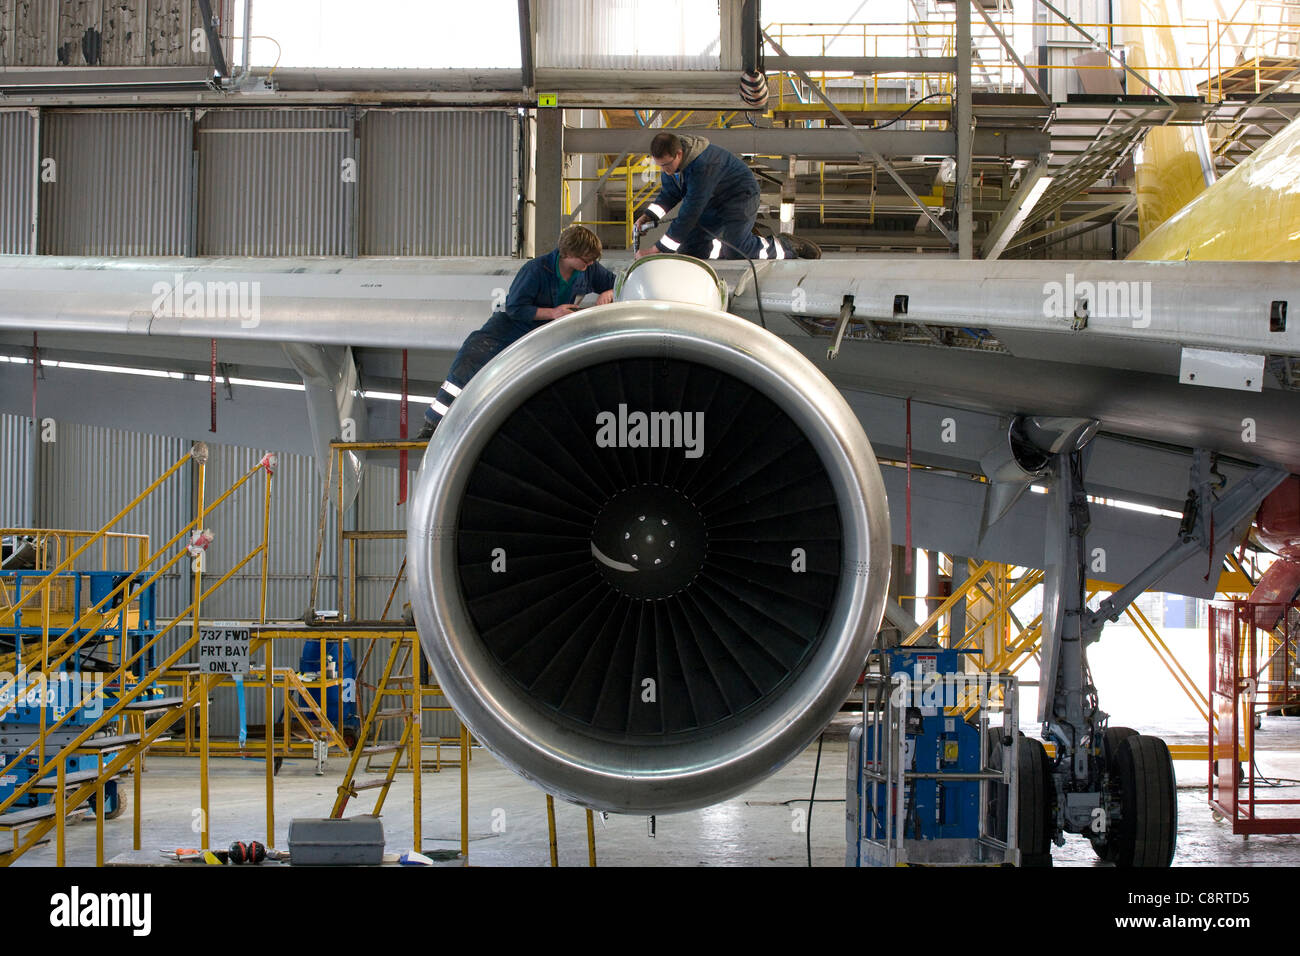 Boeing 757 inspection & maintenance - Stock Image